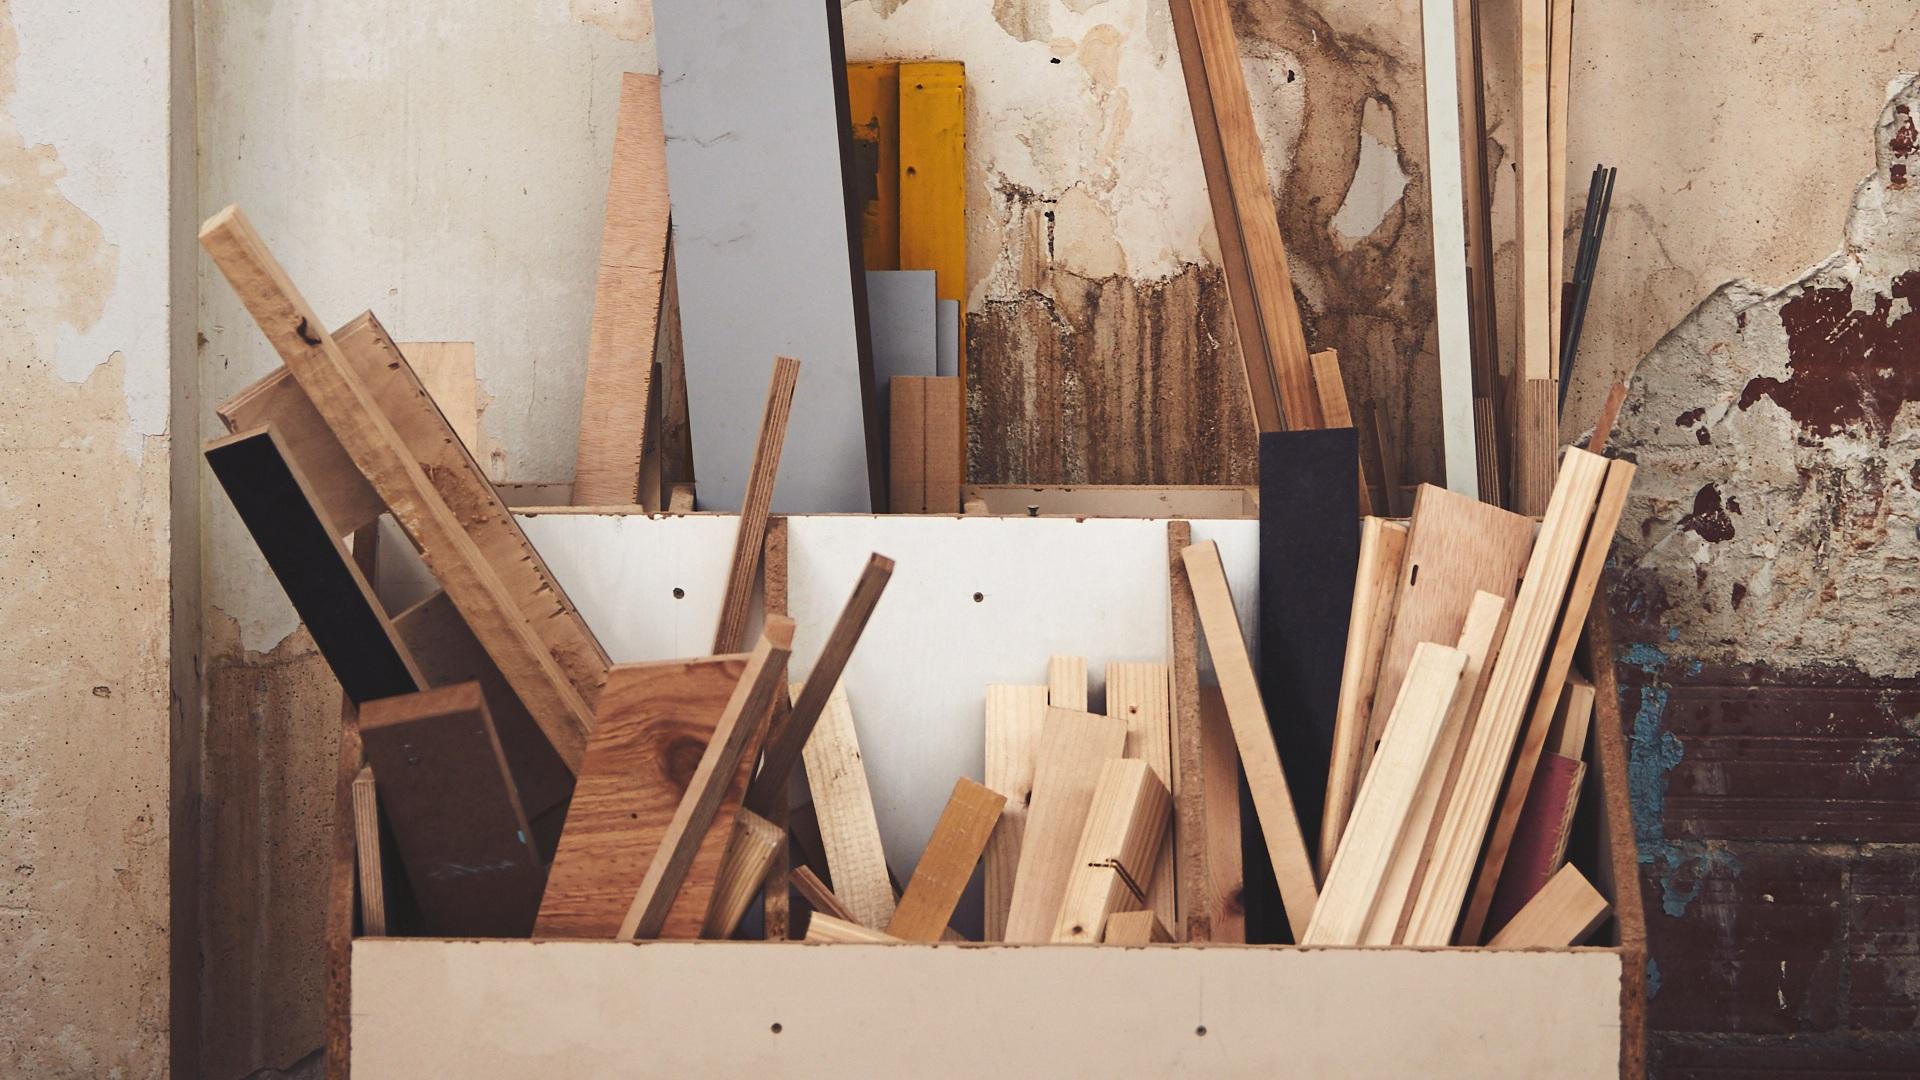 comprar madera carpinteria barcelona